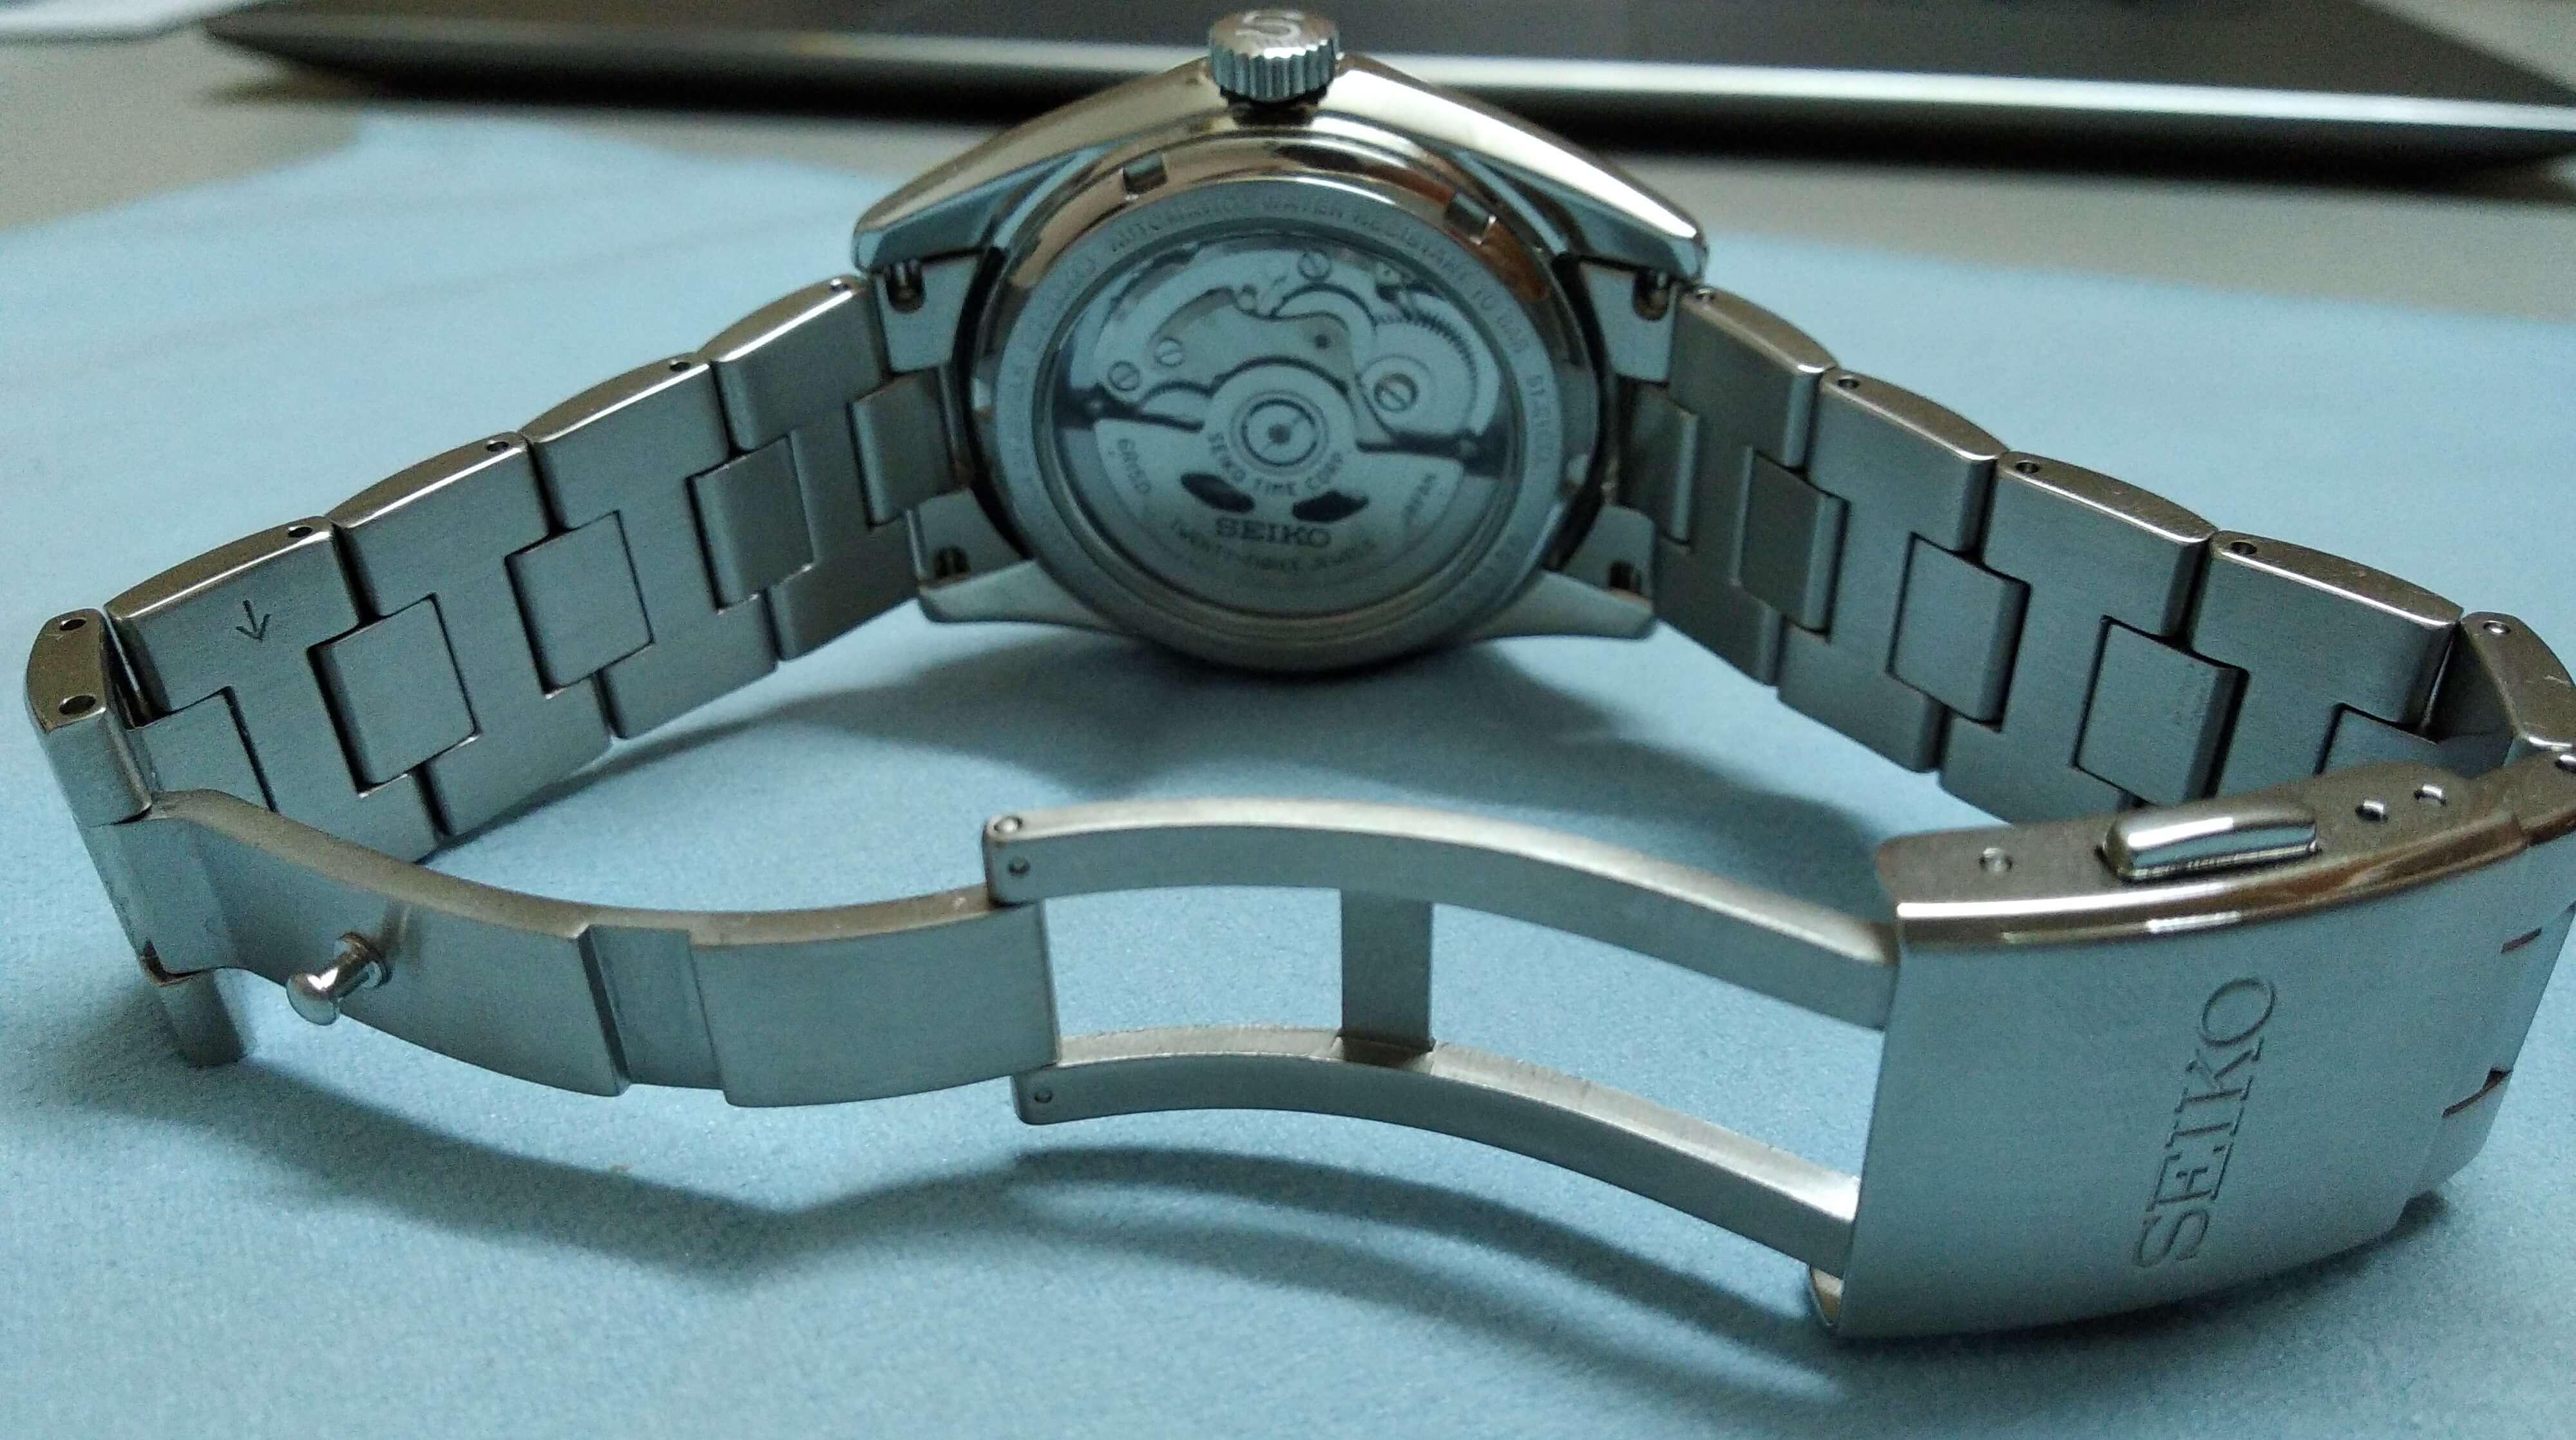 Seiko SARB033 clasp bracelet